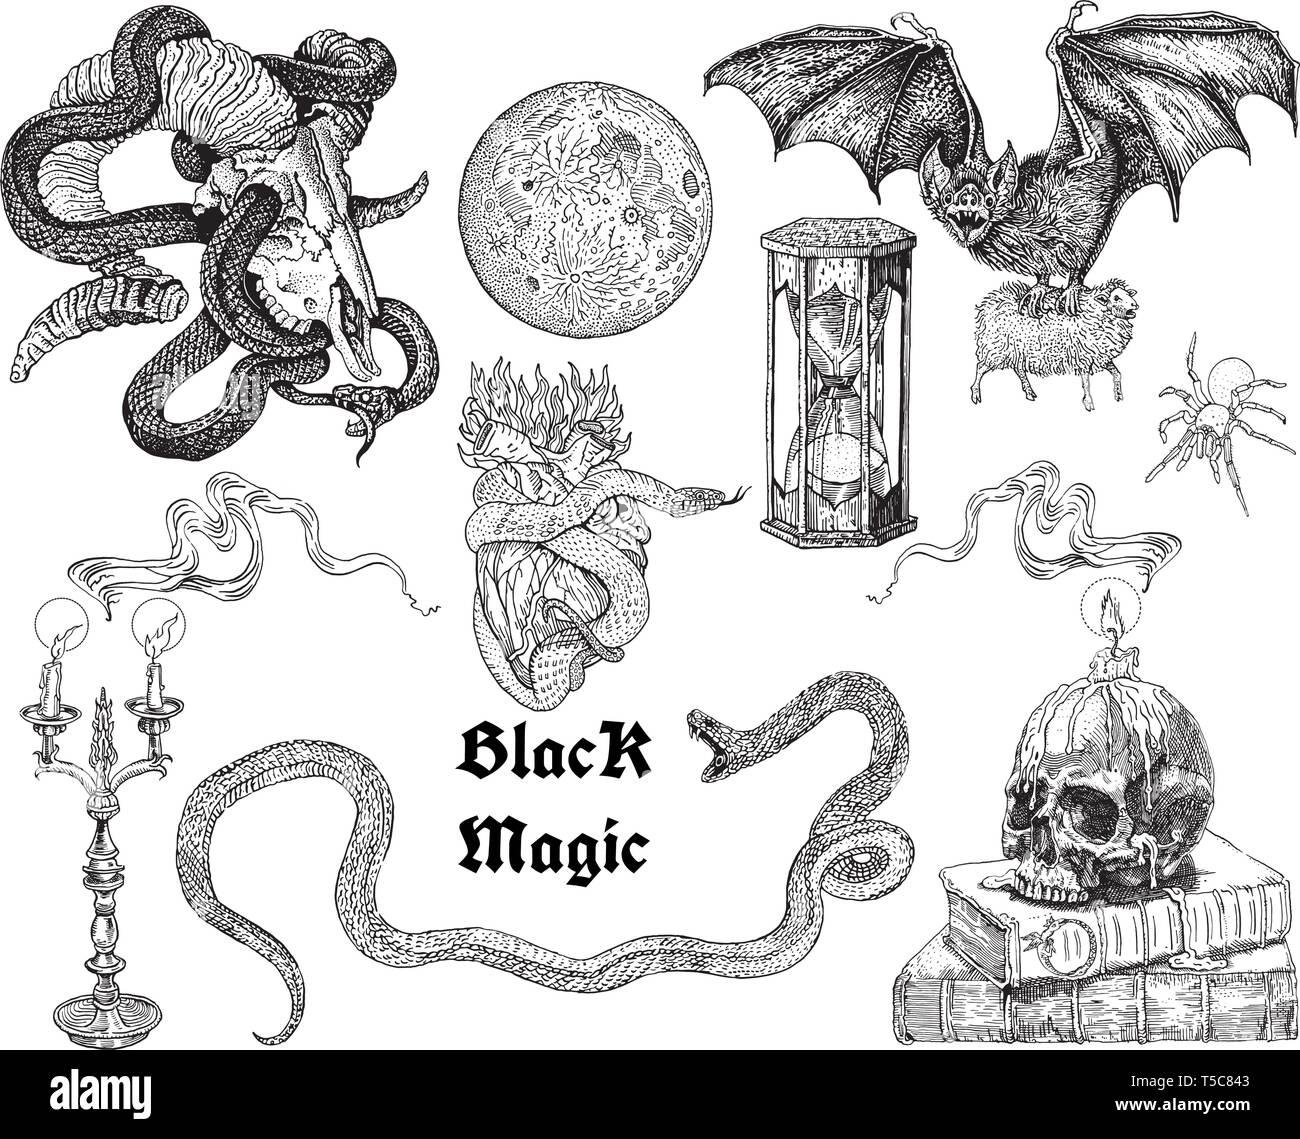 Goat Of Black Magic Stock Photos & Goat Of Black Magic Stock